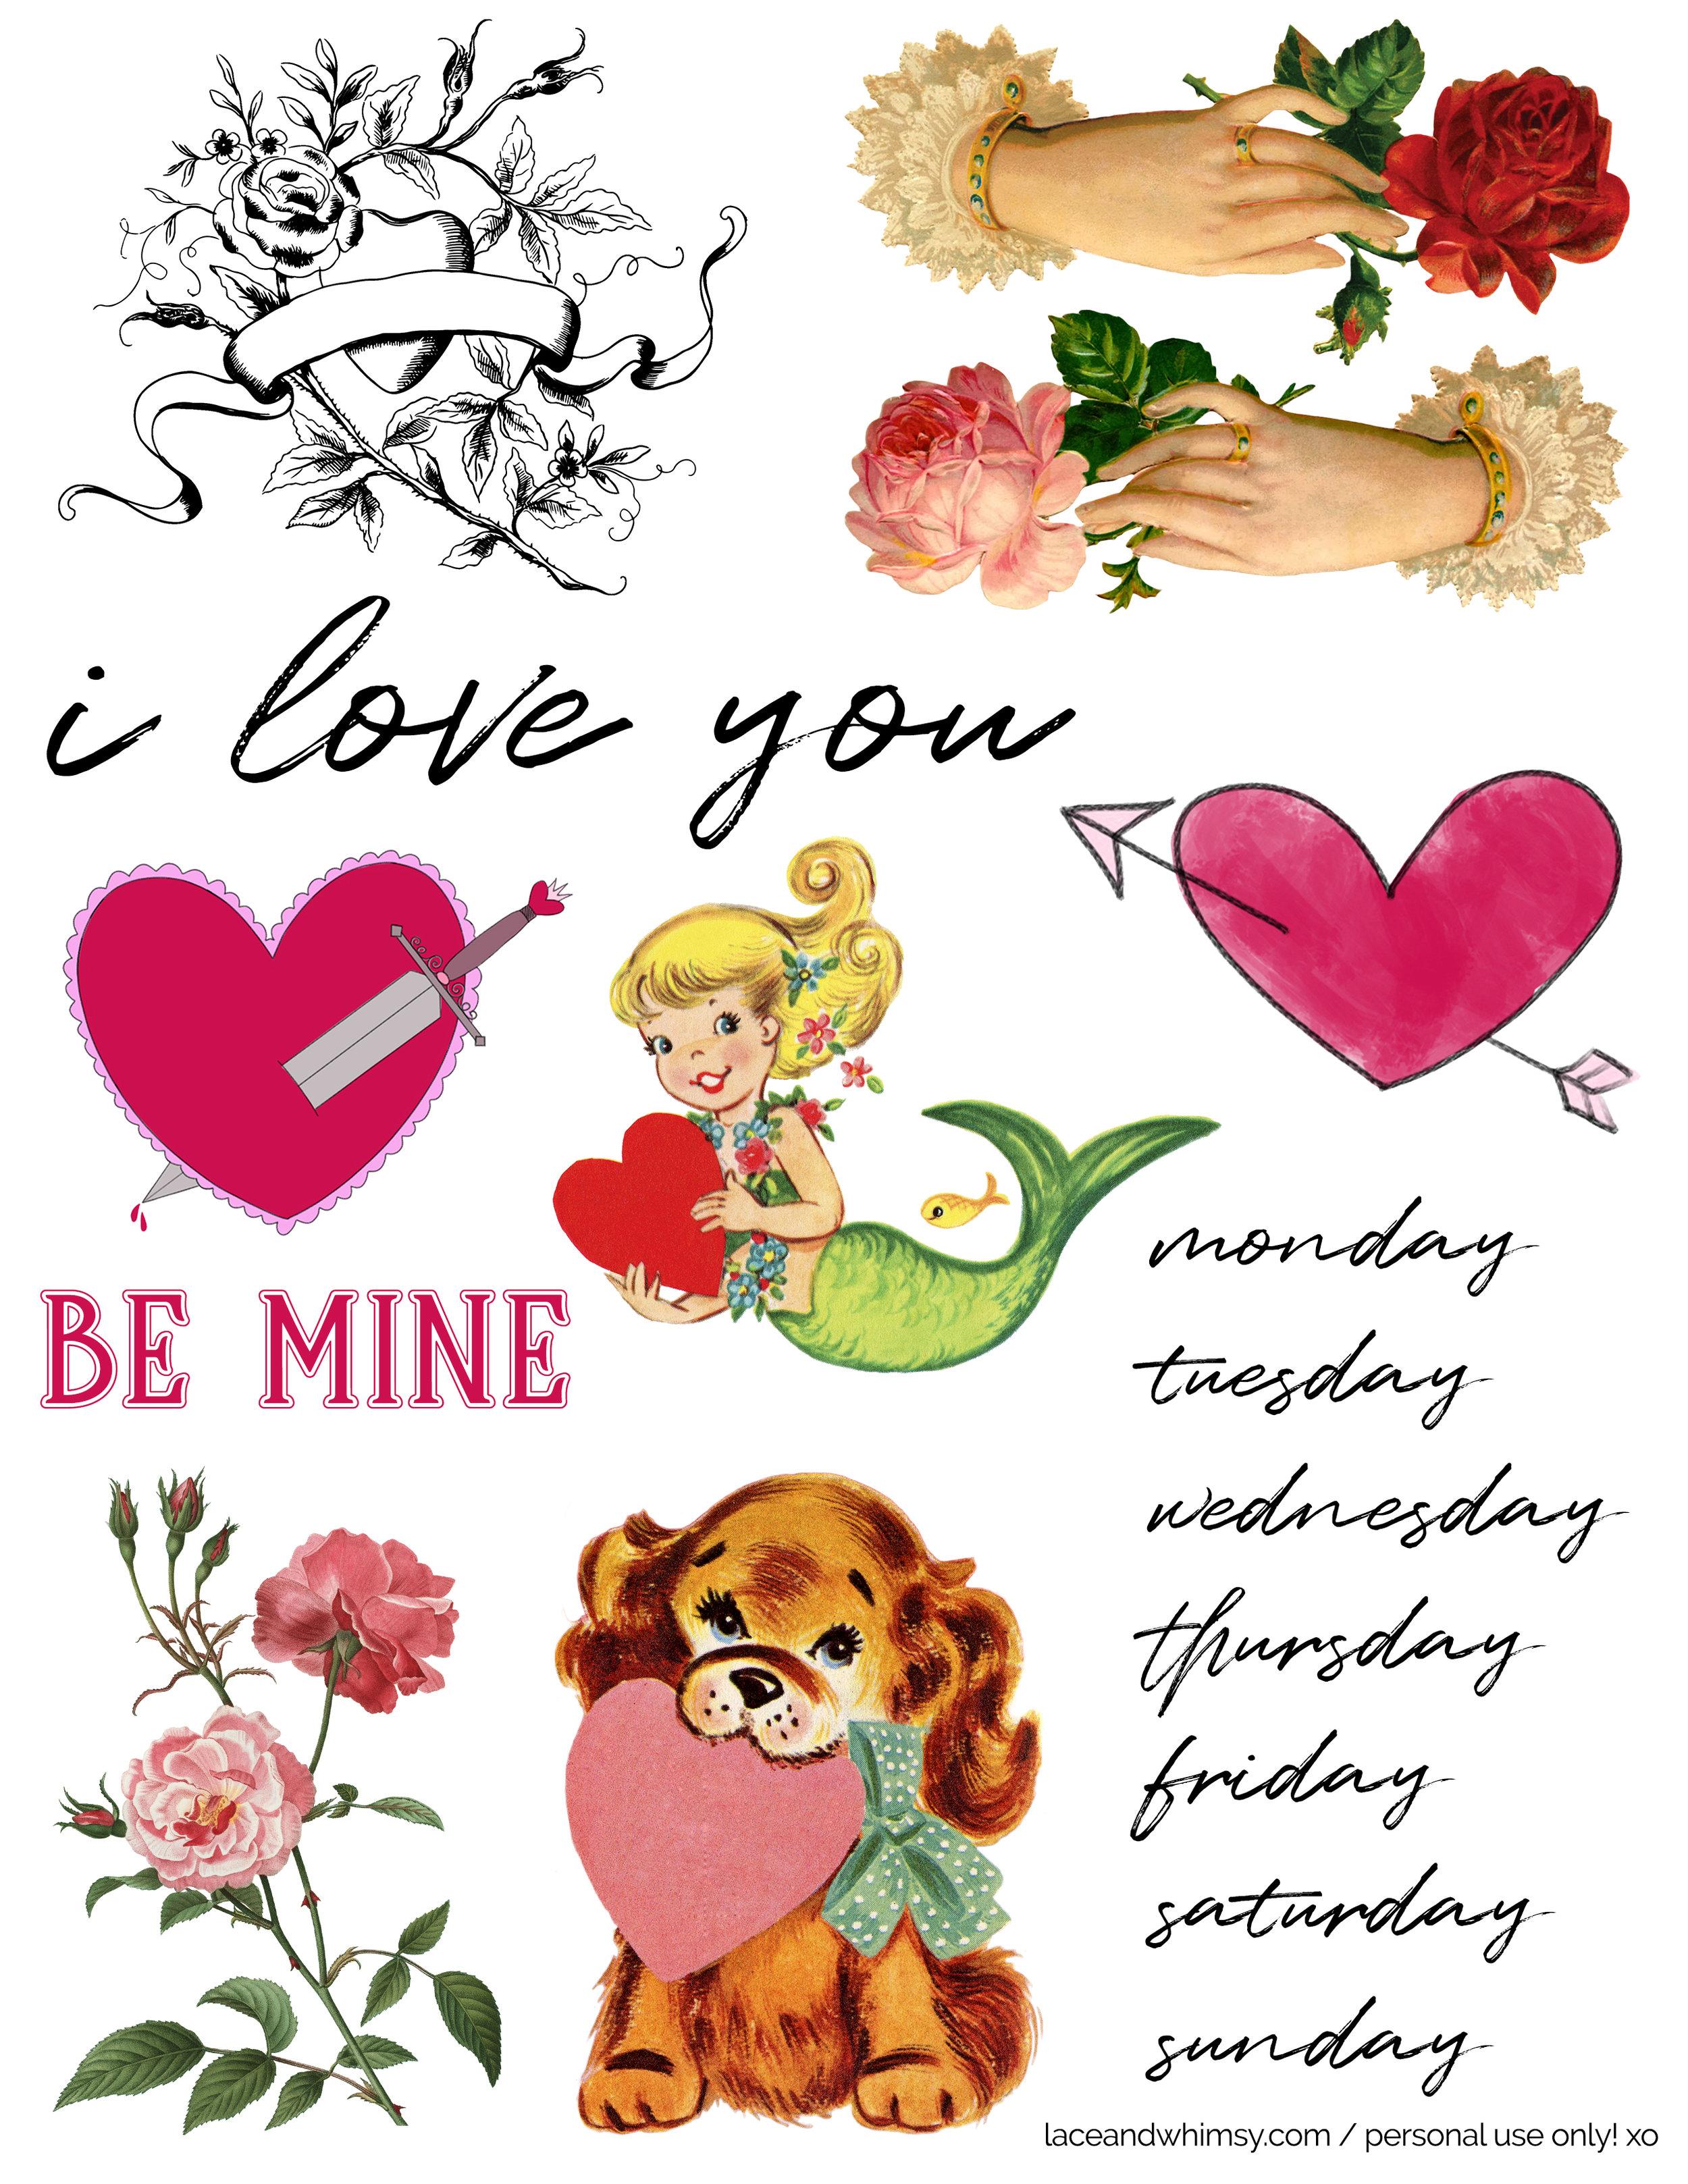 laceandwhimsy-valentine's-printable-collage-sheet.jpg